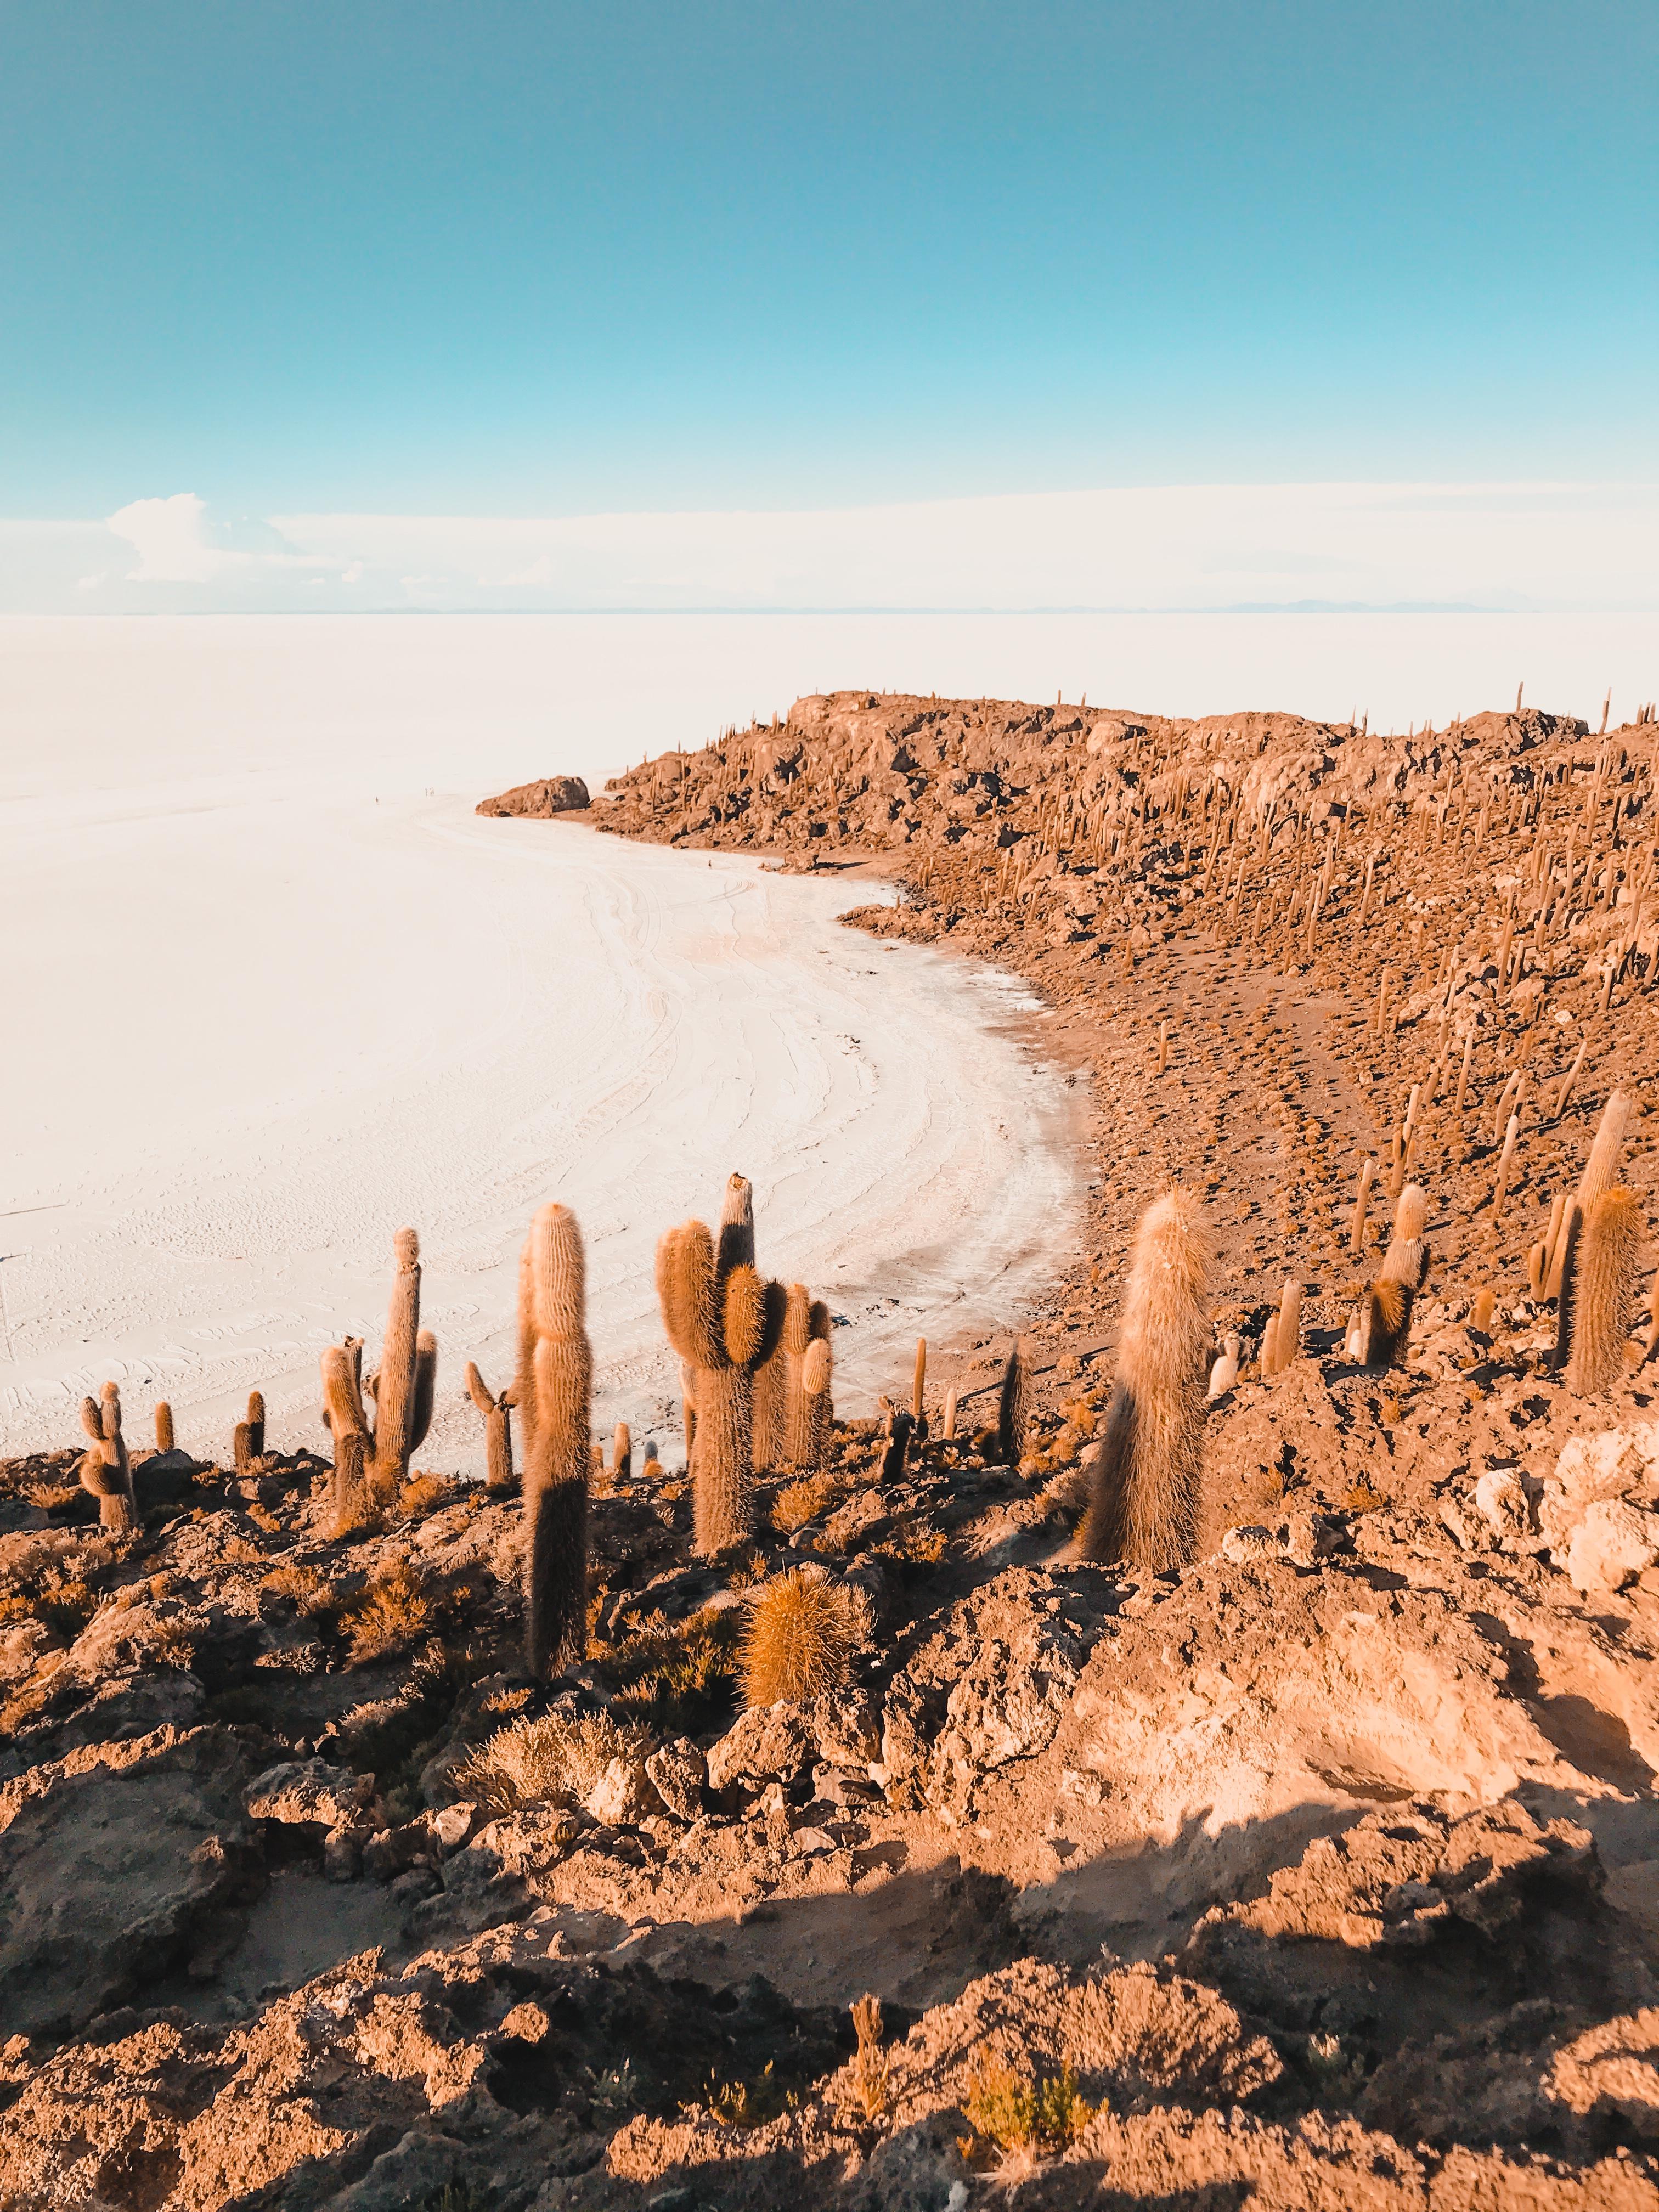 Cactus island in Uyuni